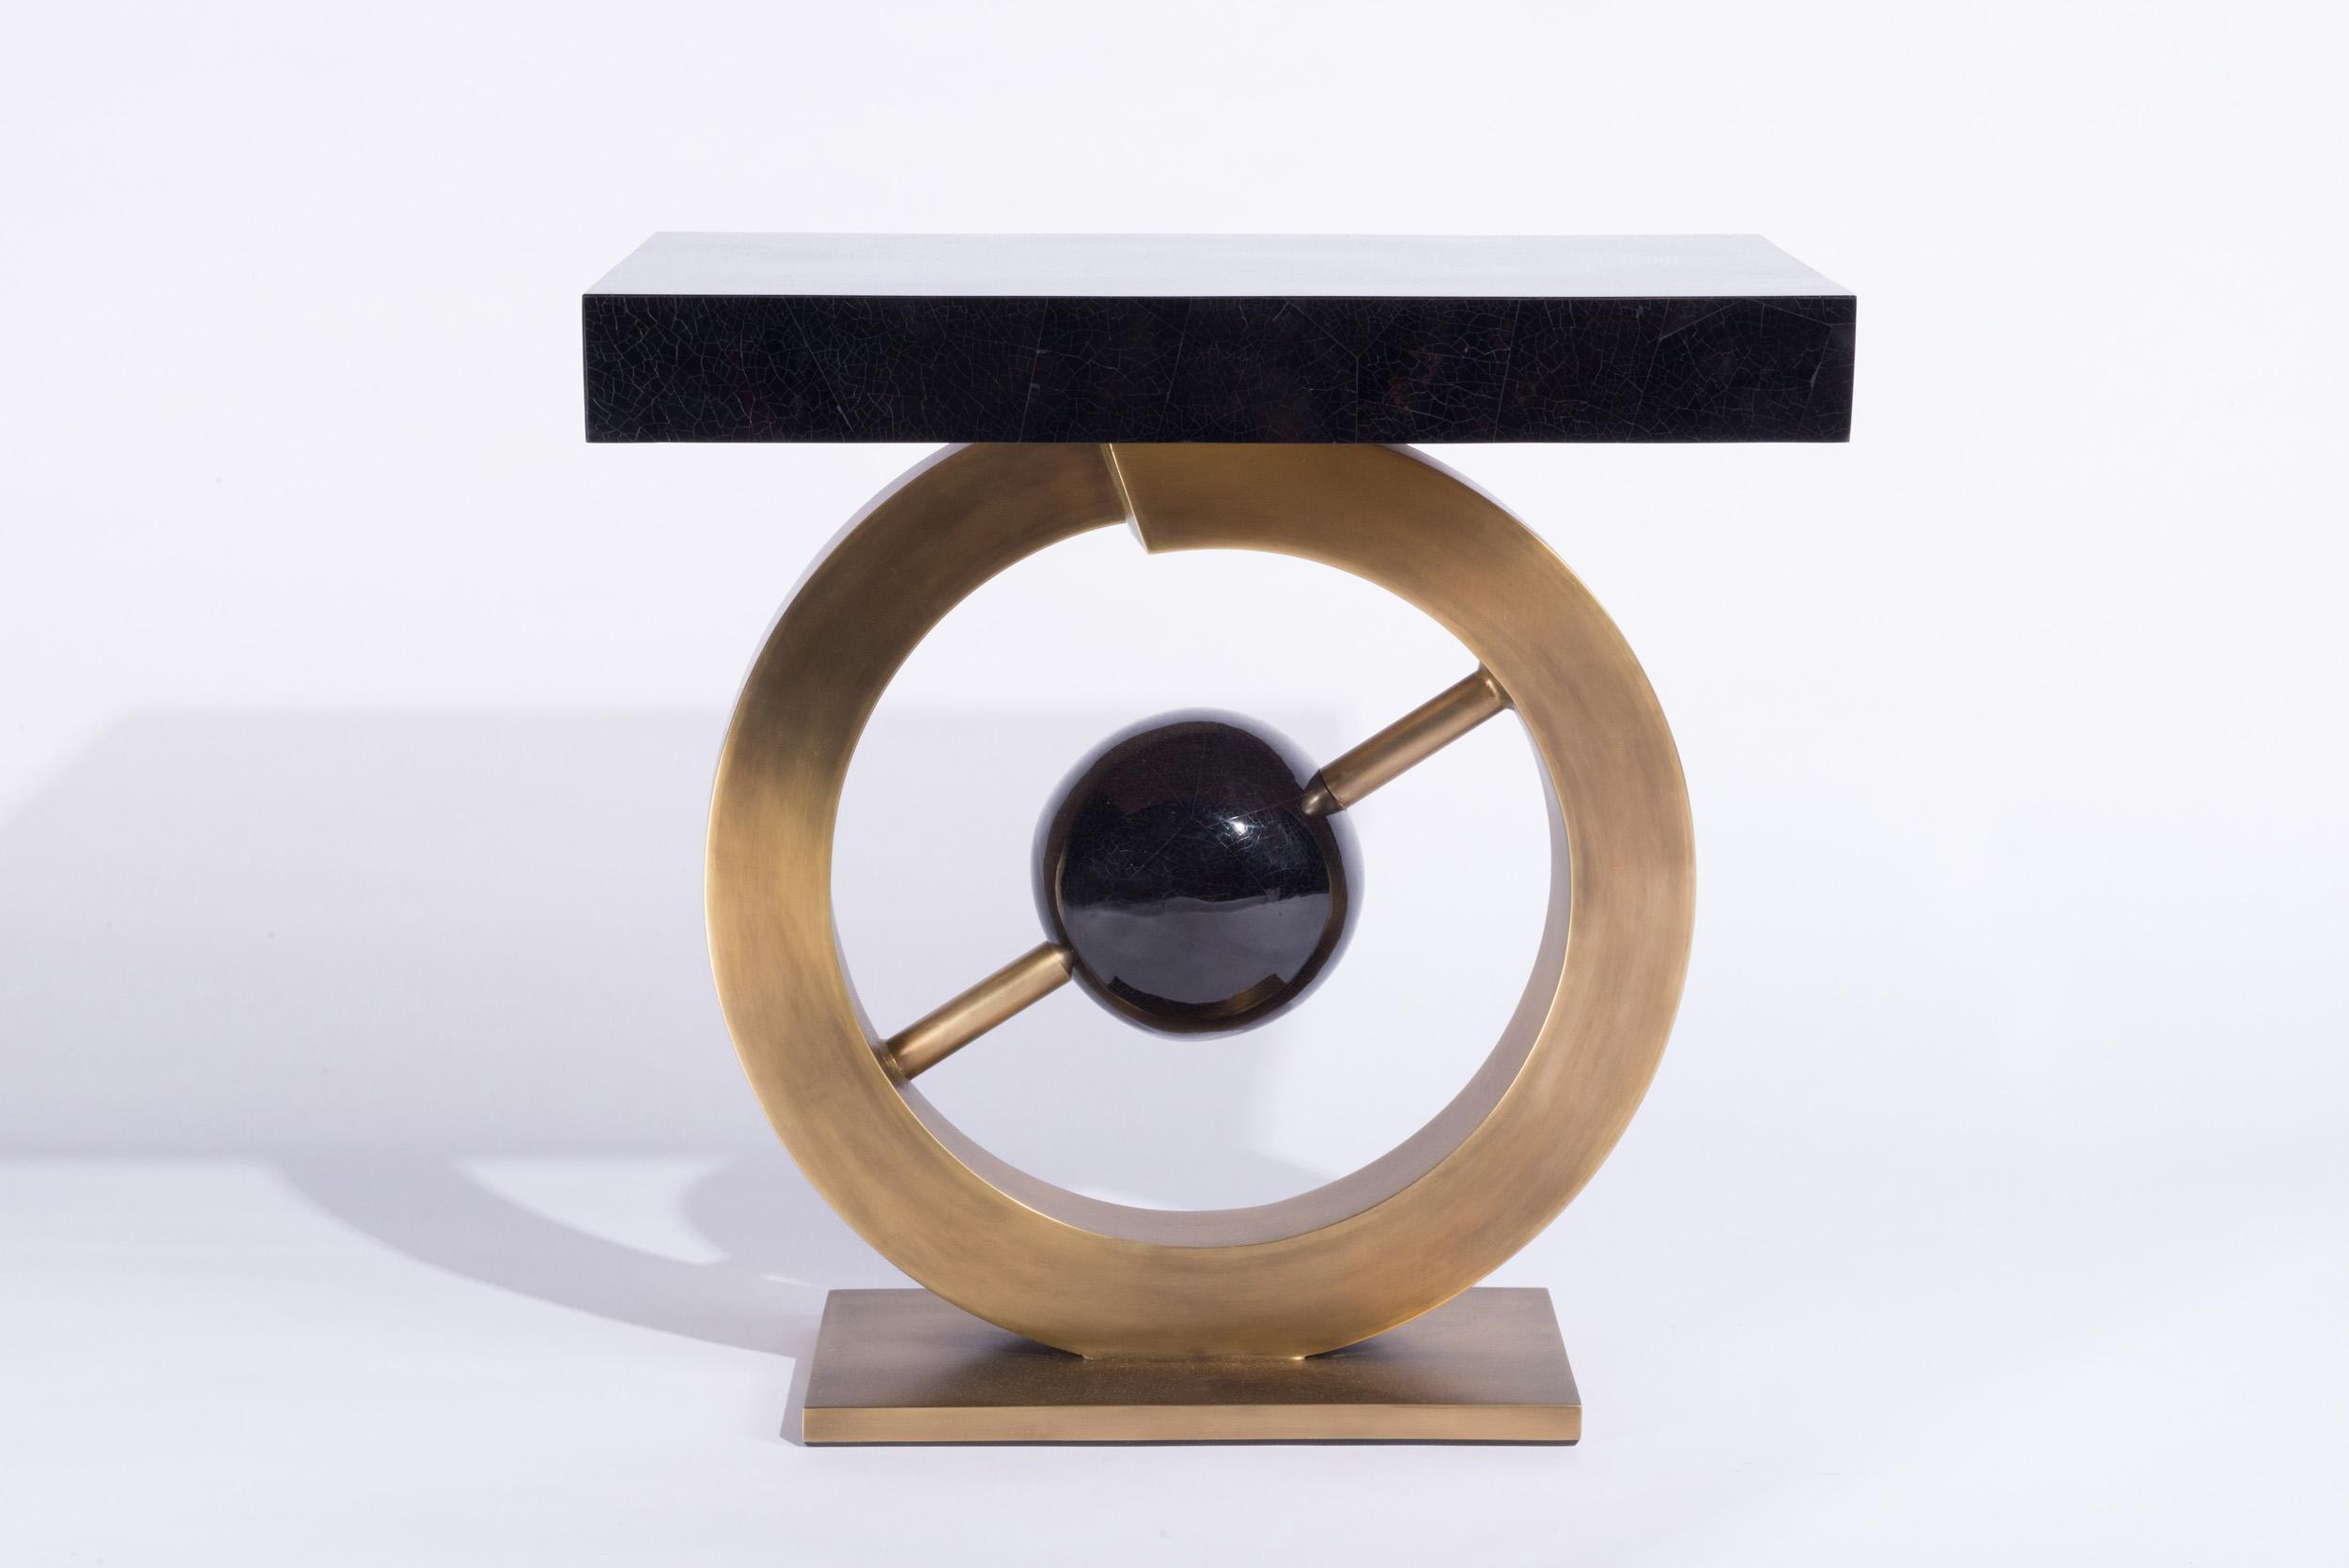 kifu-paris-table-KST18-L9-v1.jpg